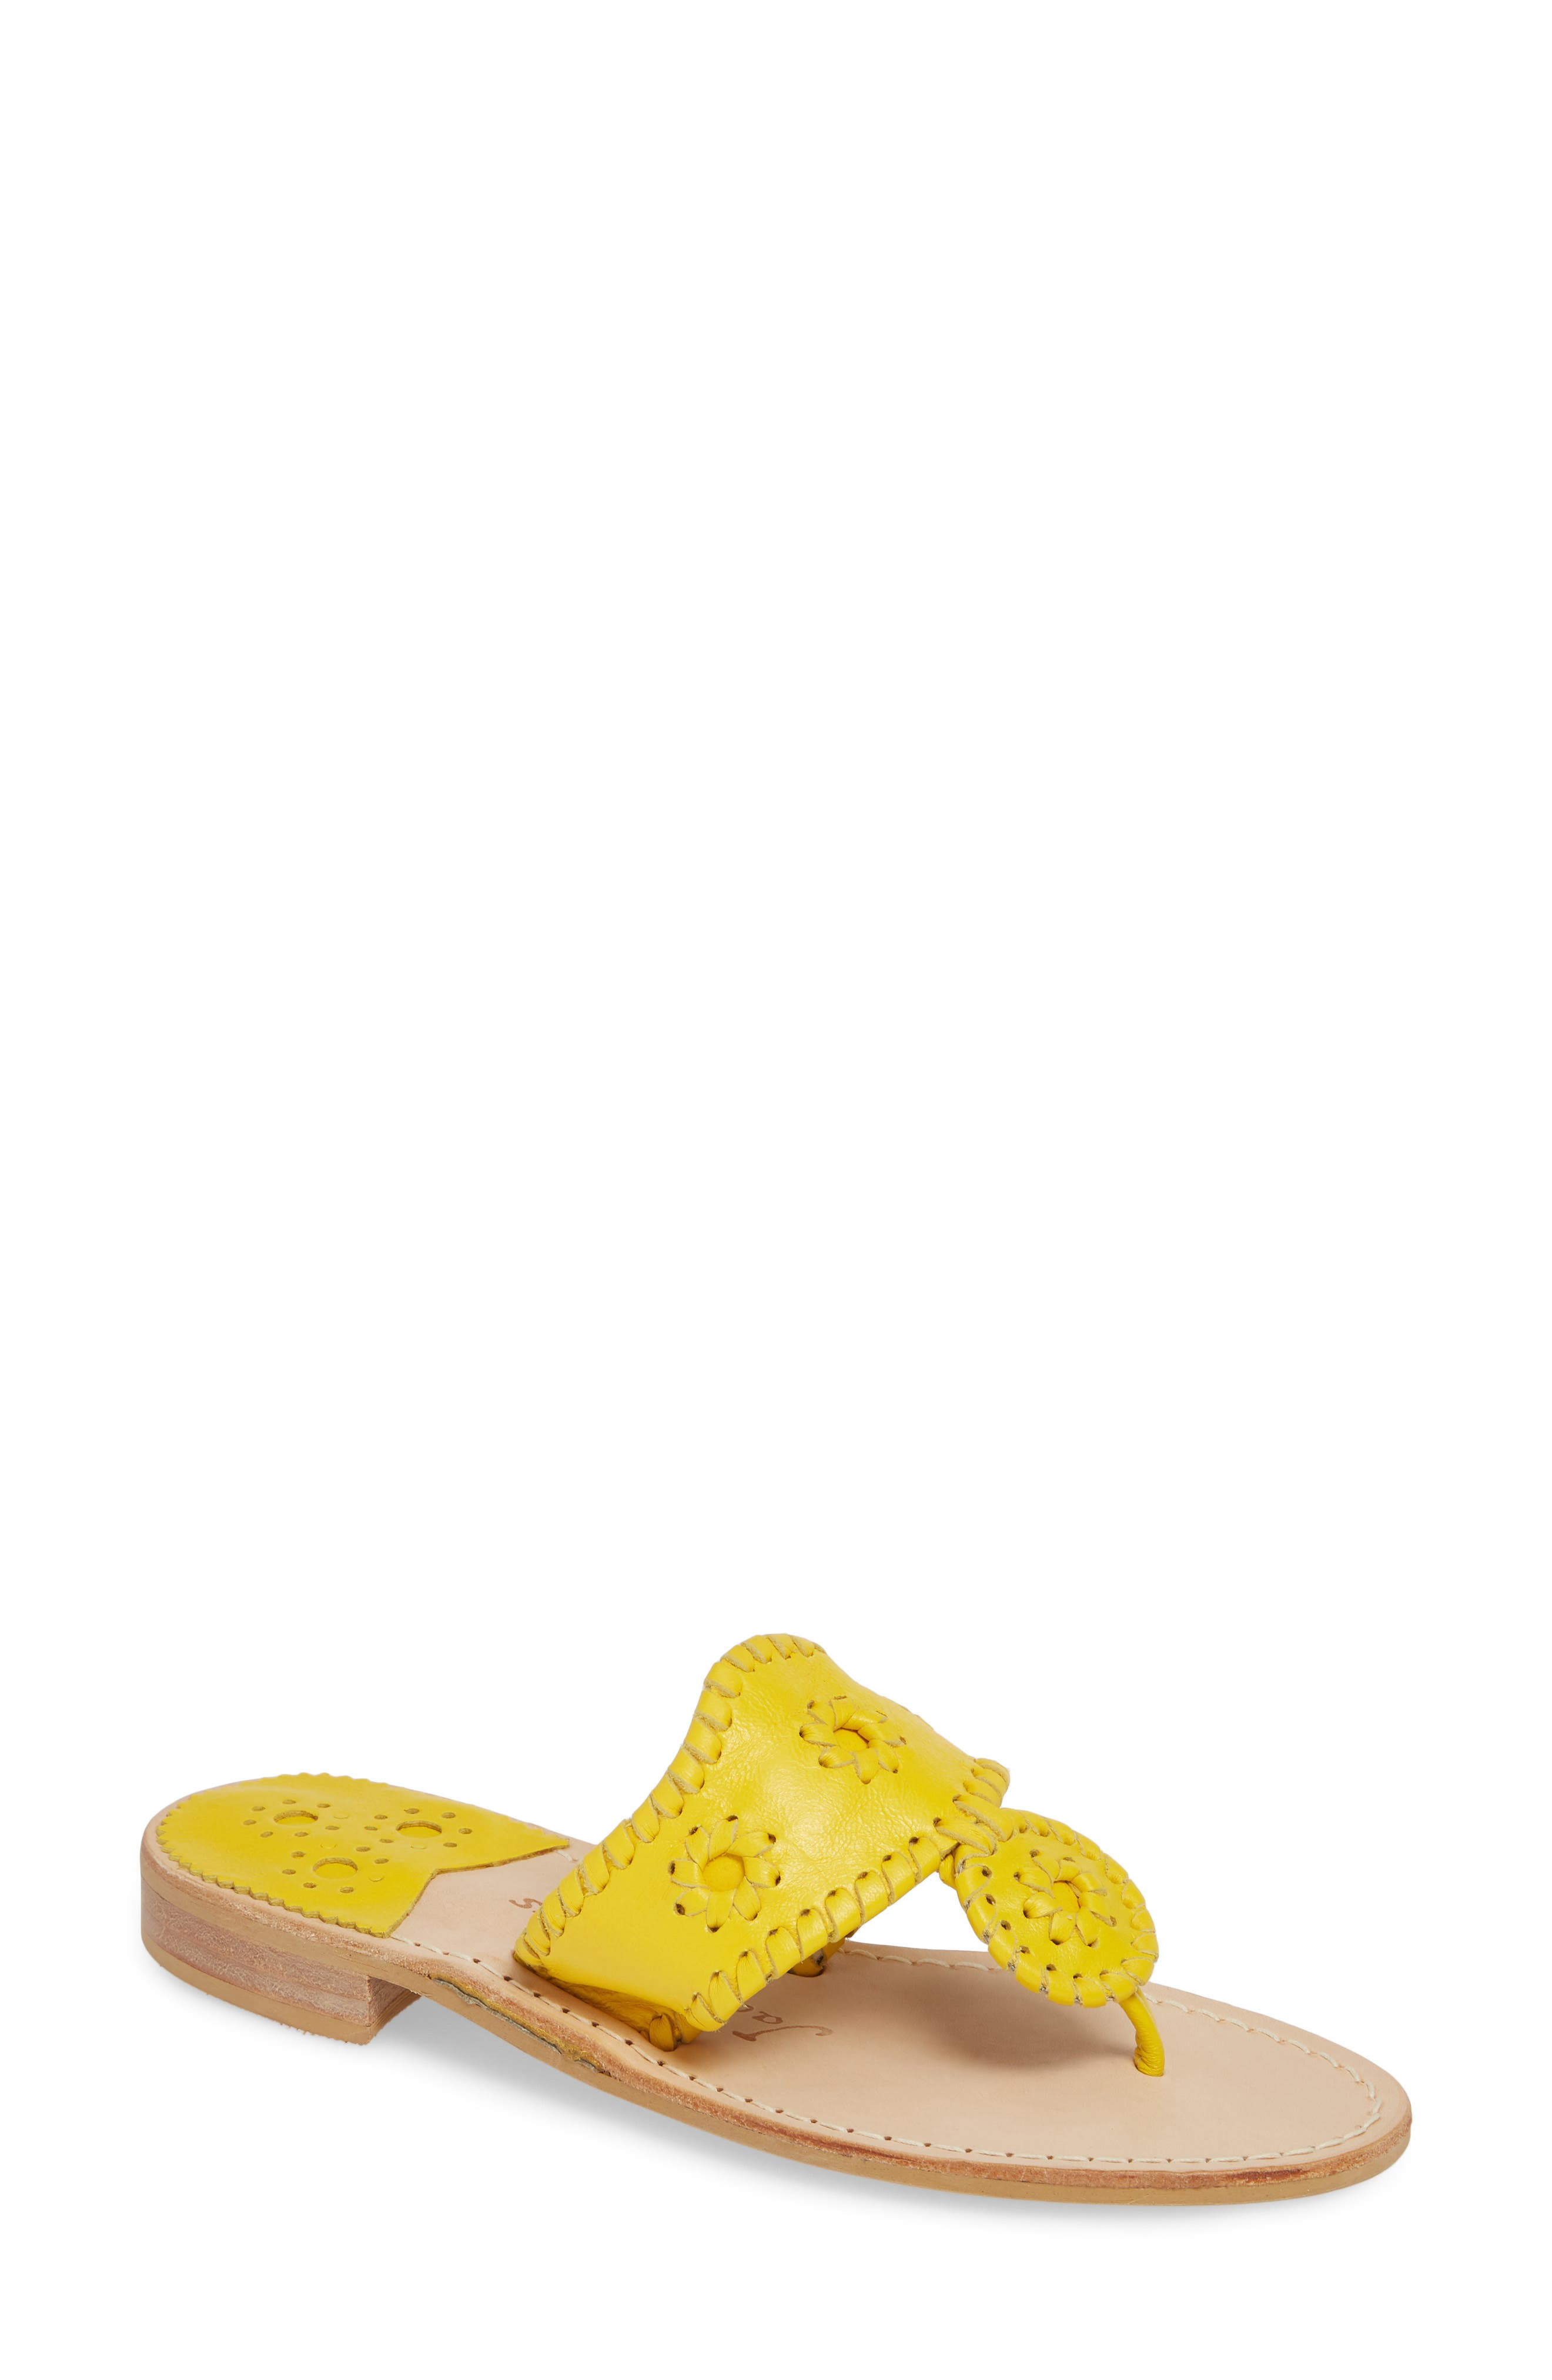 ea40dfc938d6 Jack Rogers Sandals